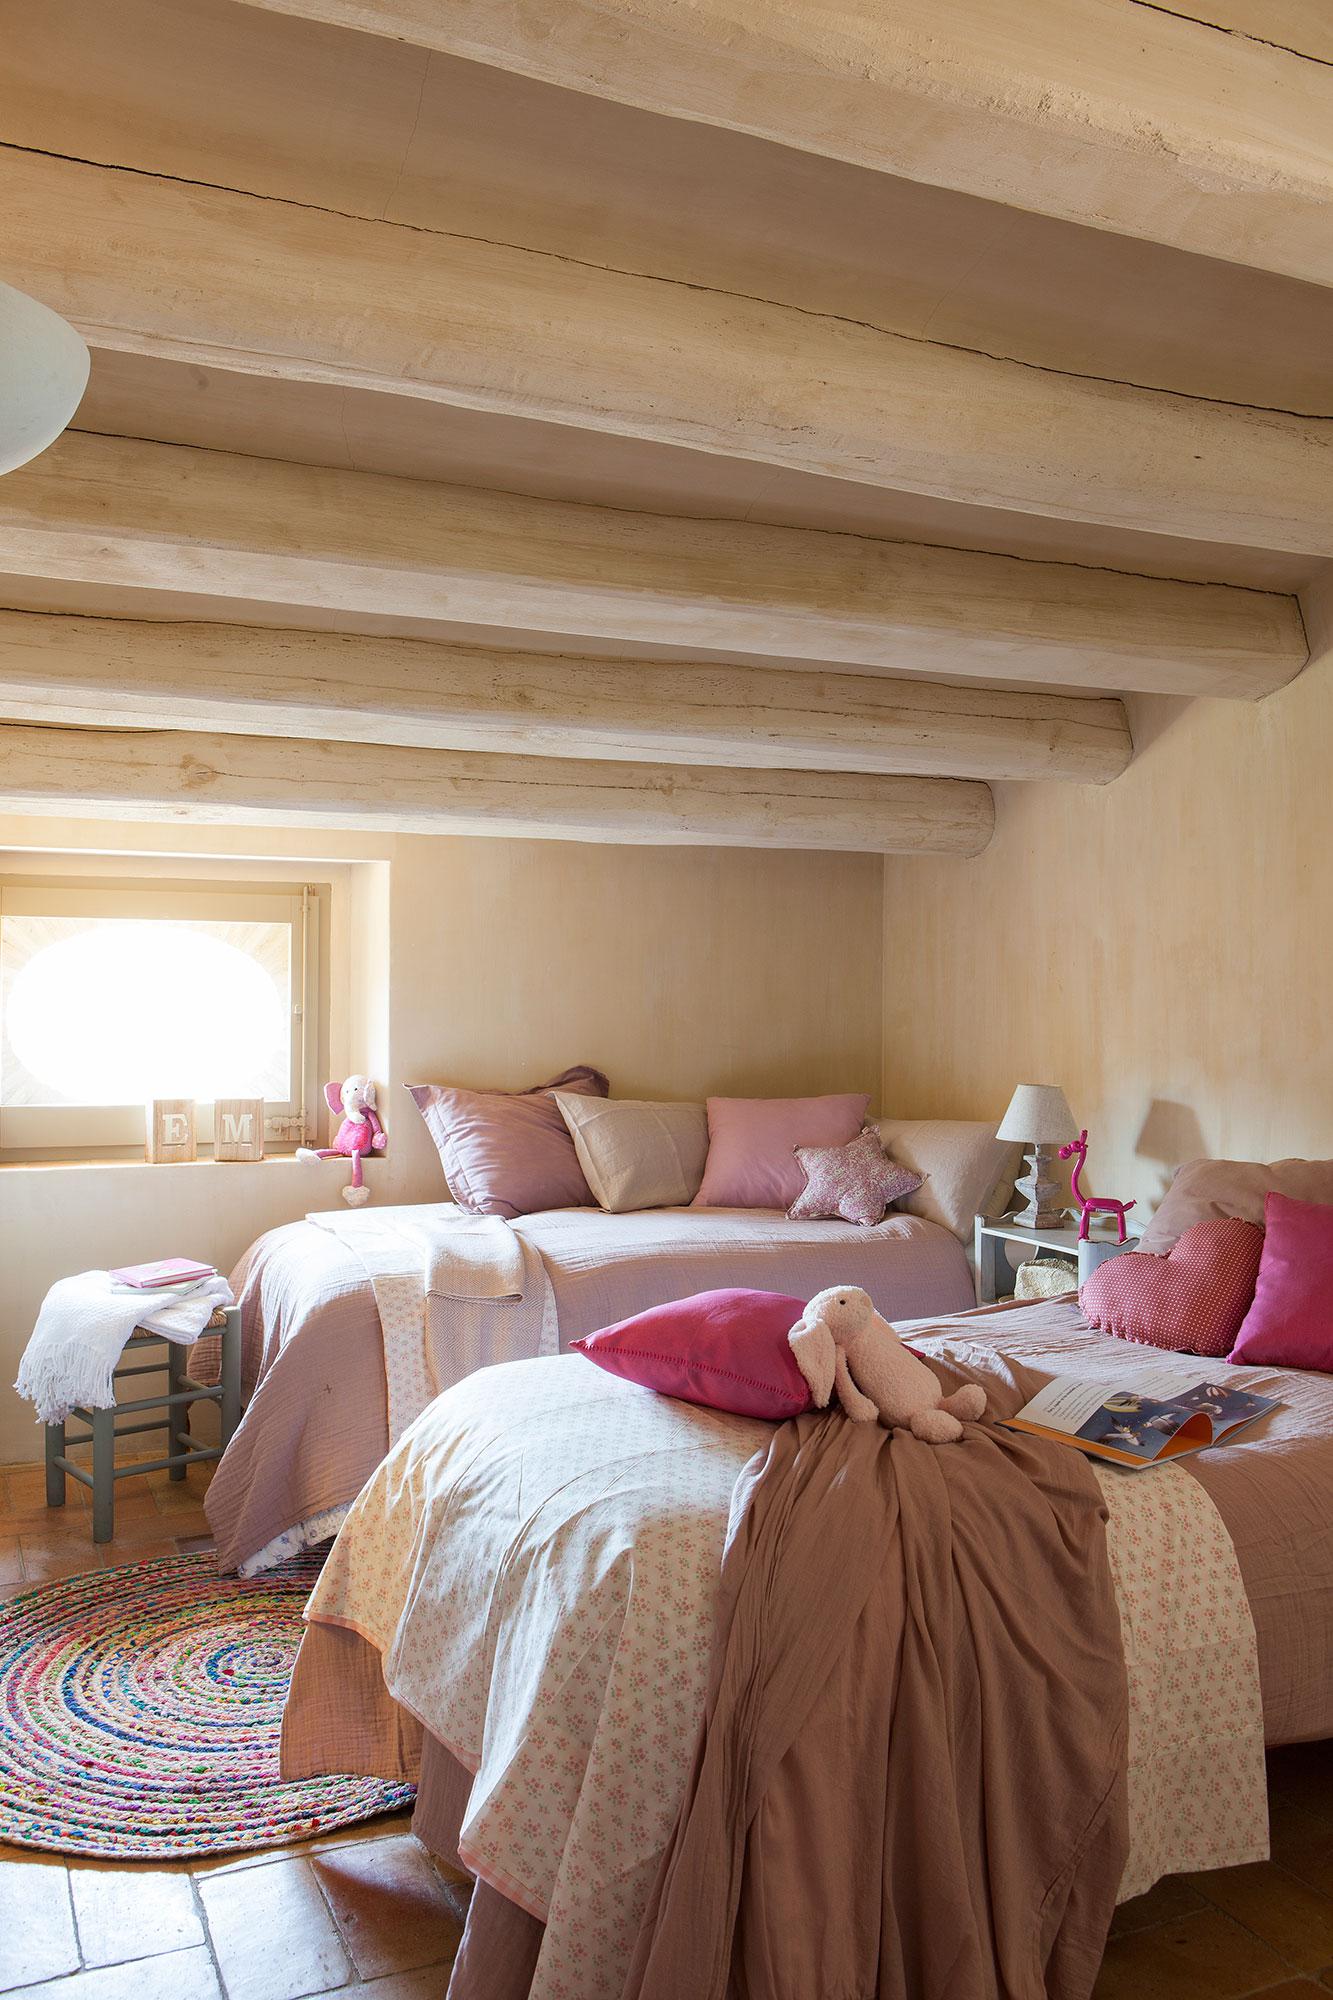 Dormitorios infantiles 7 buenas ideas para compartir - Dormitorios con dos camas ...